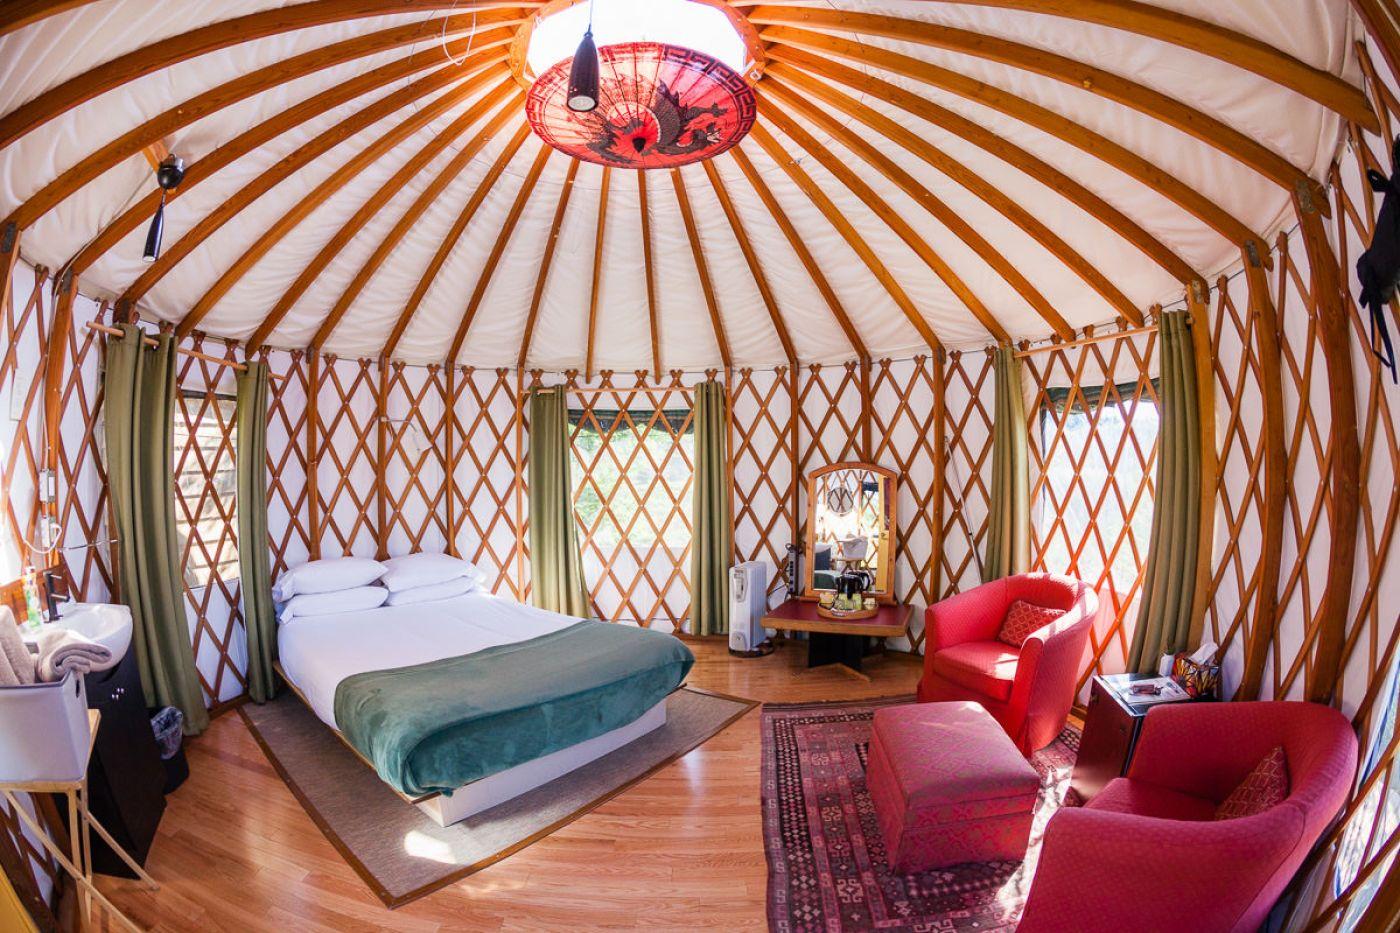 Carmanah Yurt Soule Creek Lodge I Port Renfrew Glossary external links about us contact us. carmanah yurt soule creek lodge i